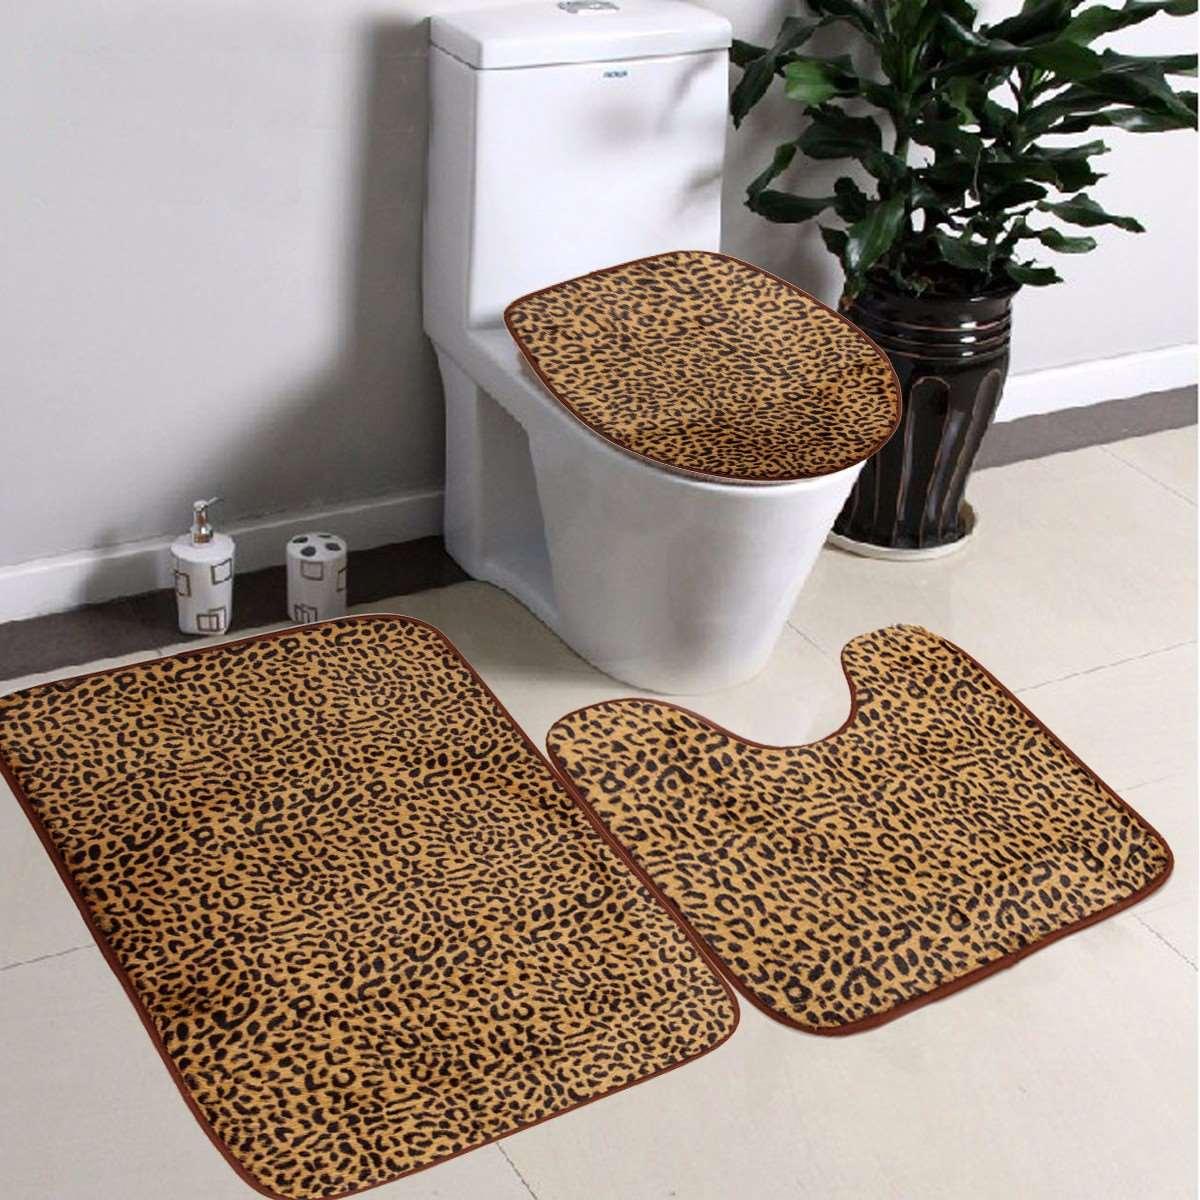 22pc bath accessories set pink zebra animal print bathroom rugs shower